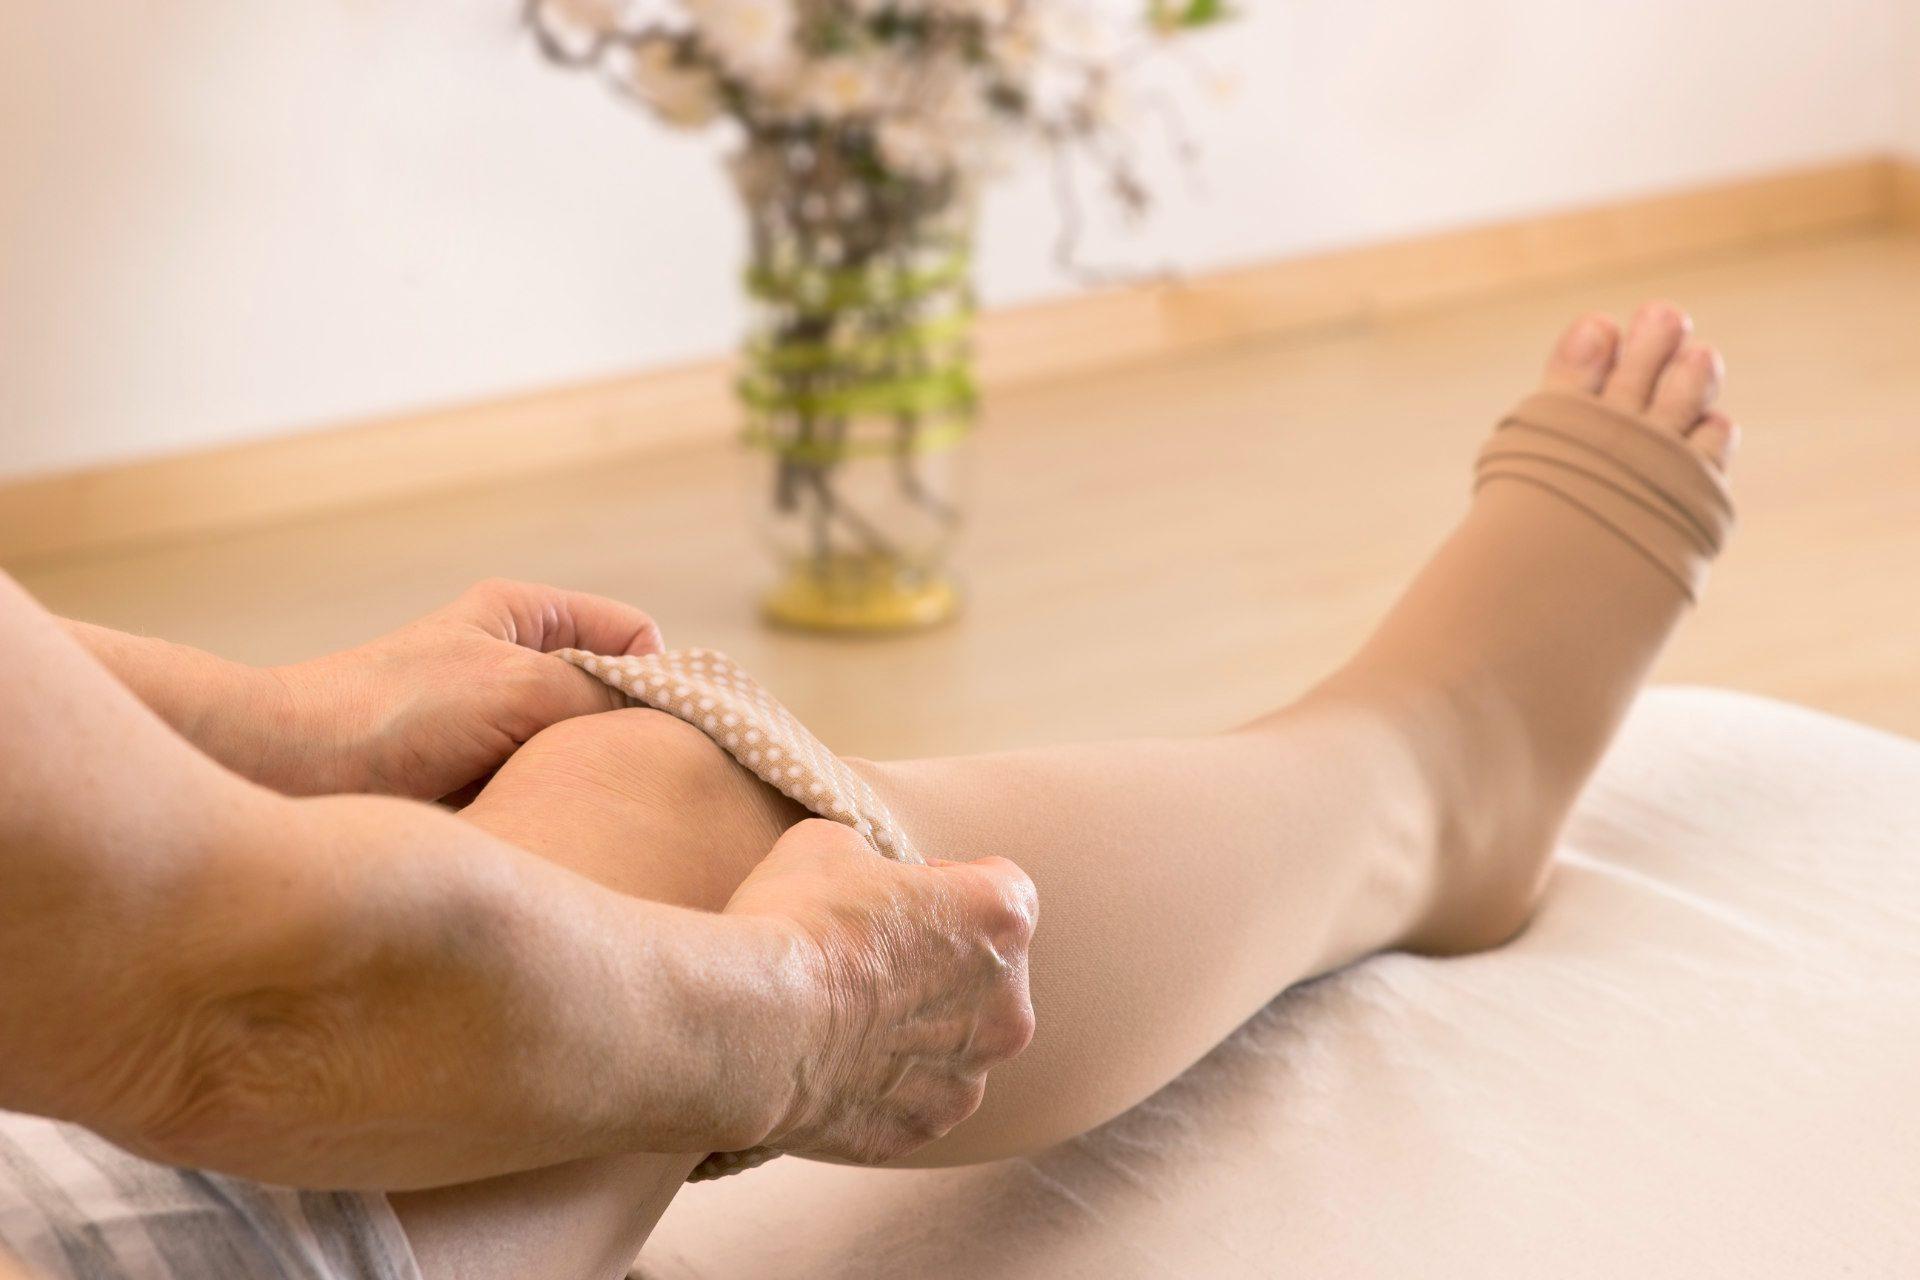 Compression socks for varicose veins - Ted Hose